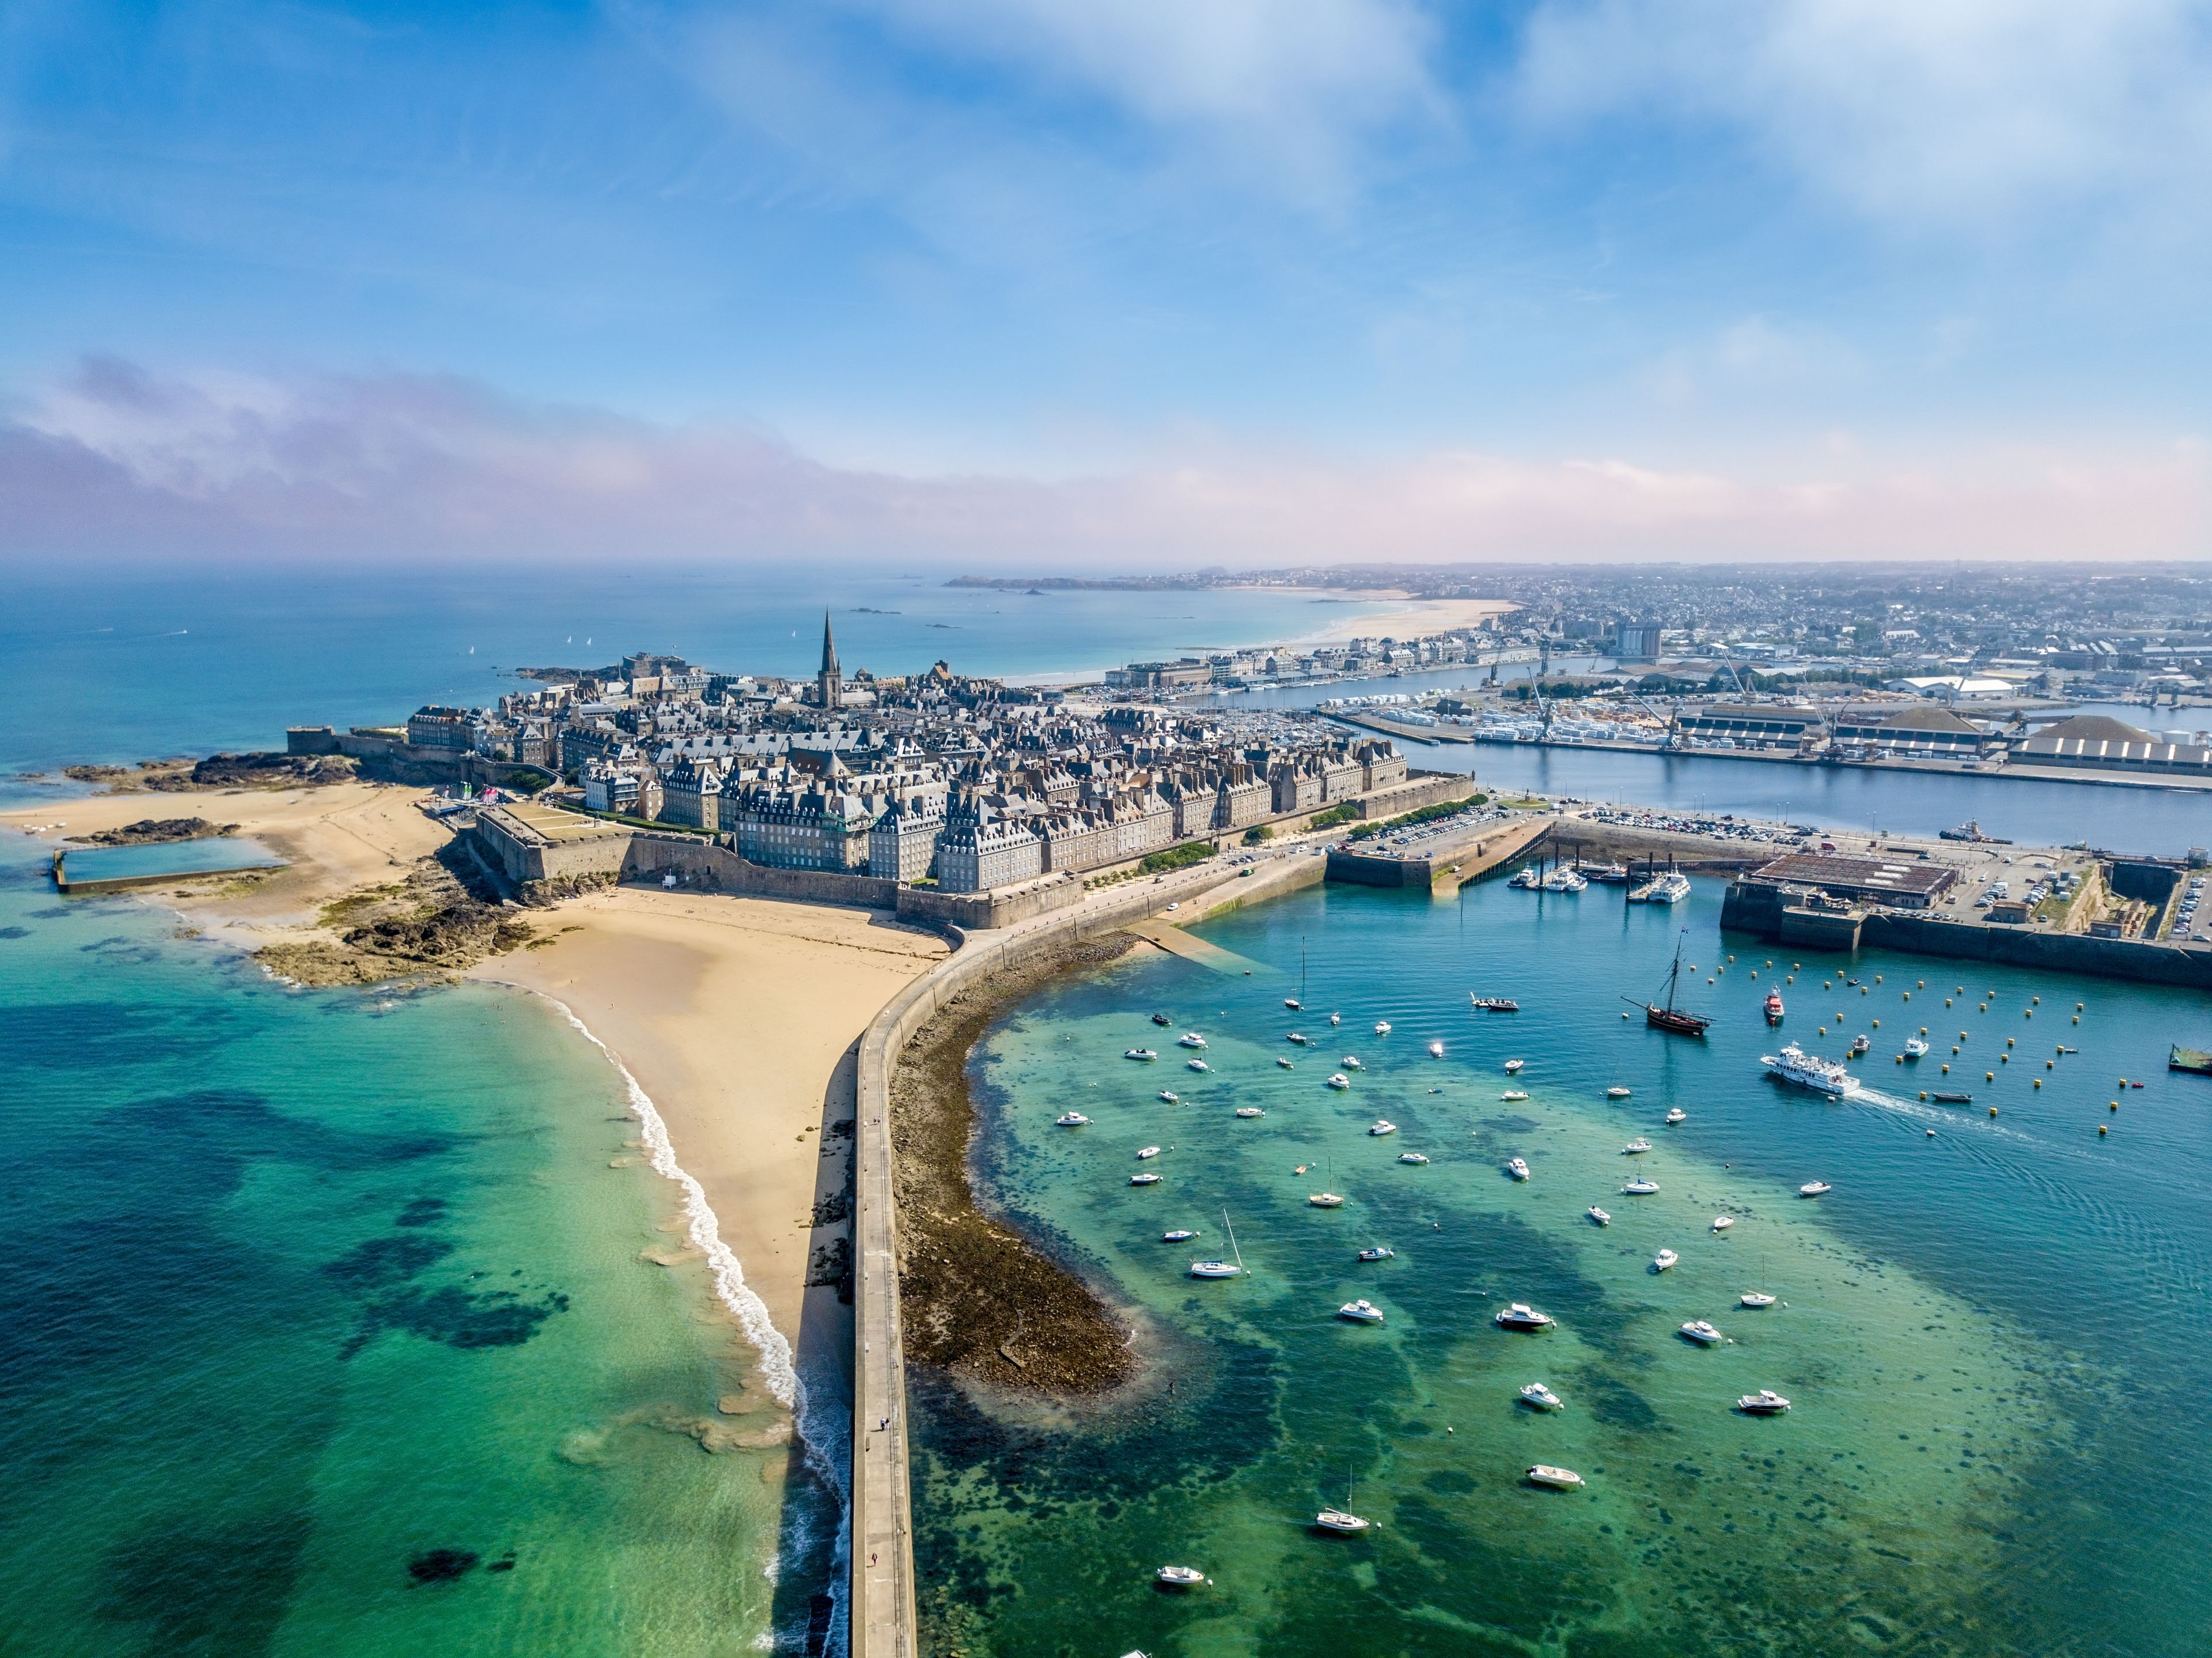 aerial-view-beautiful-city-privateers-450w-680368285.jpg